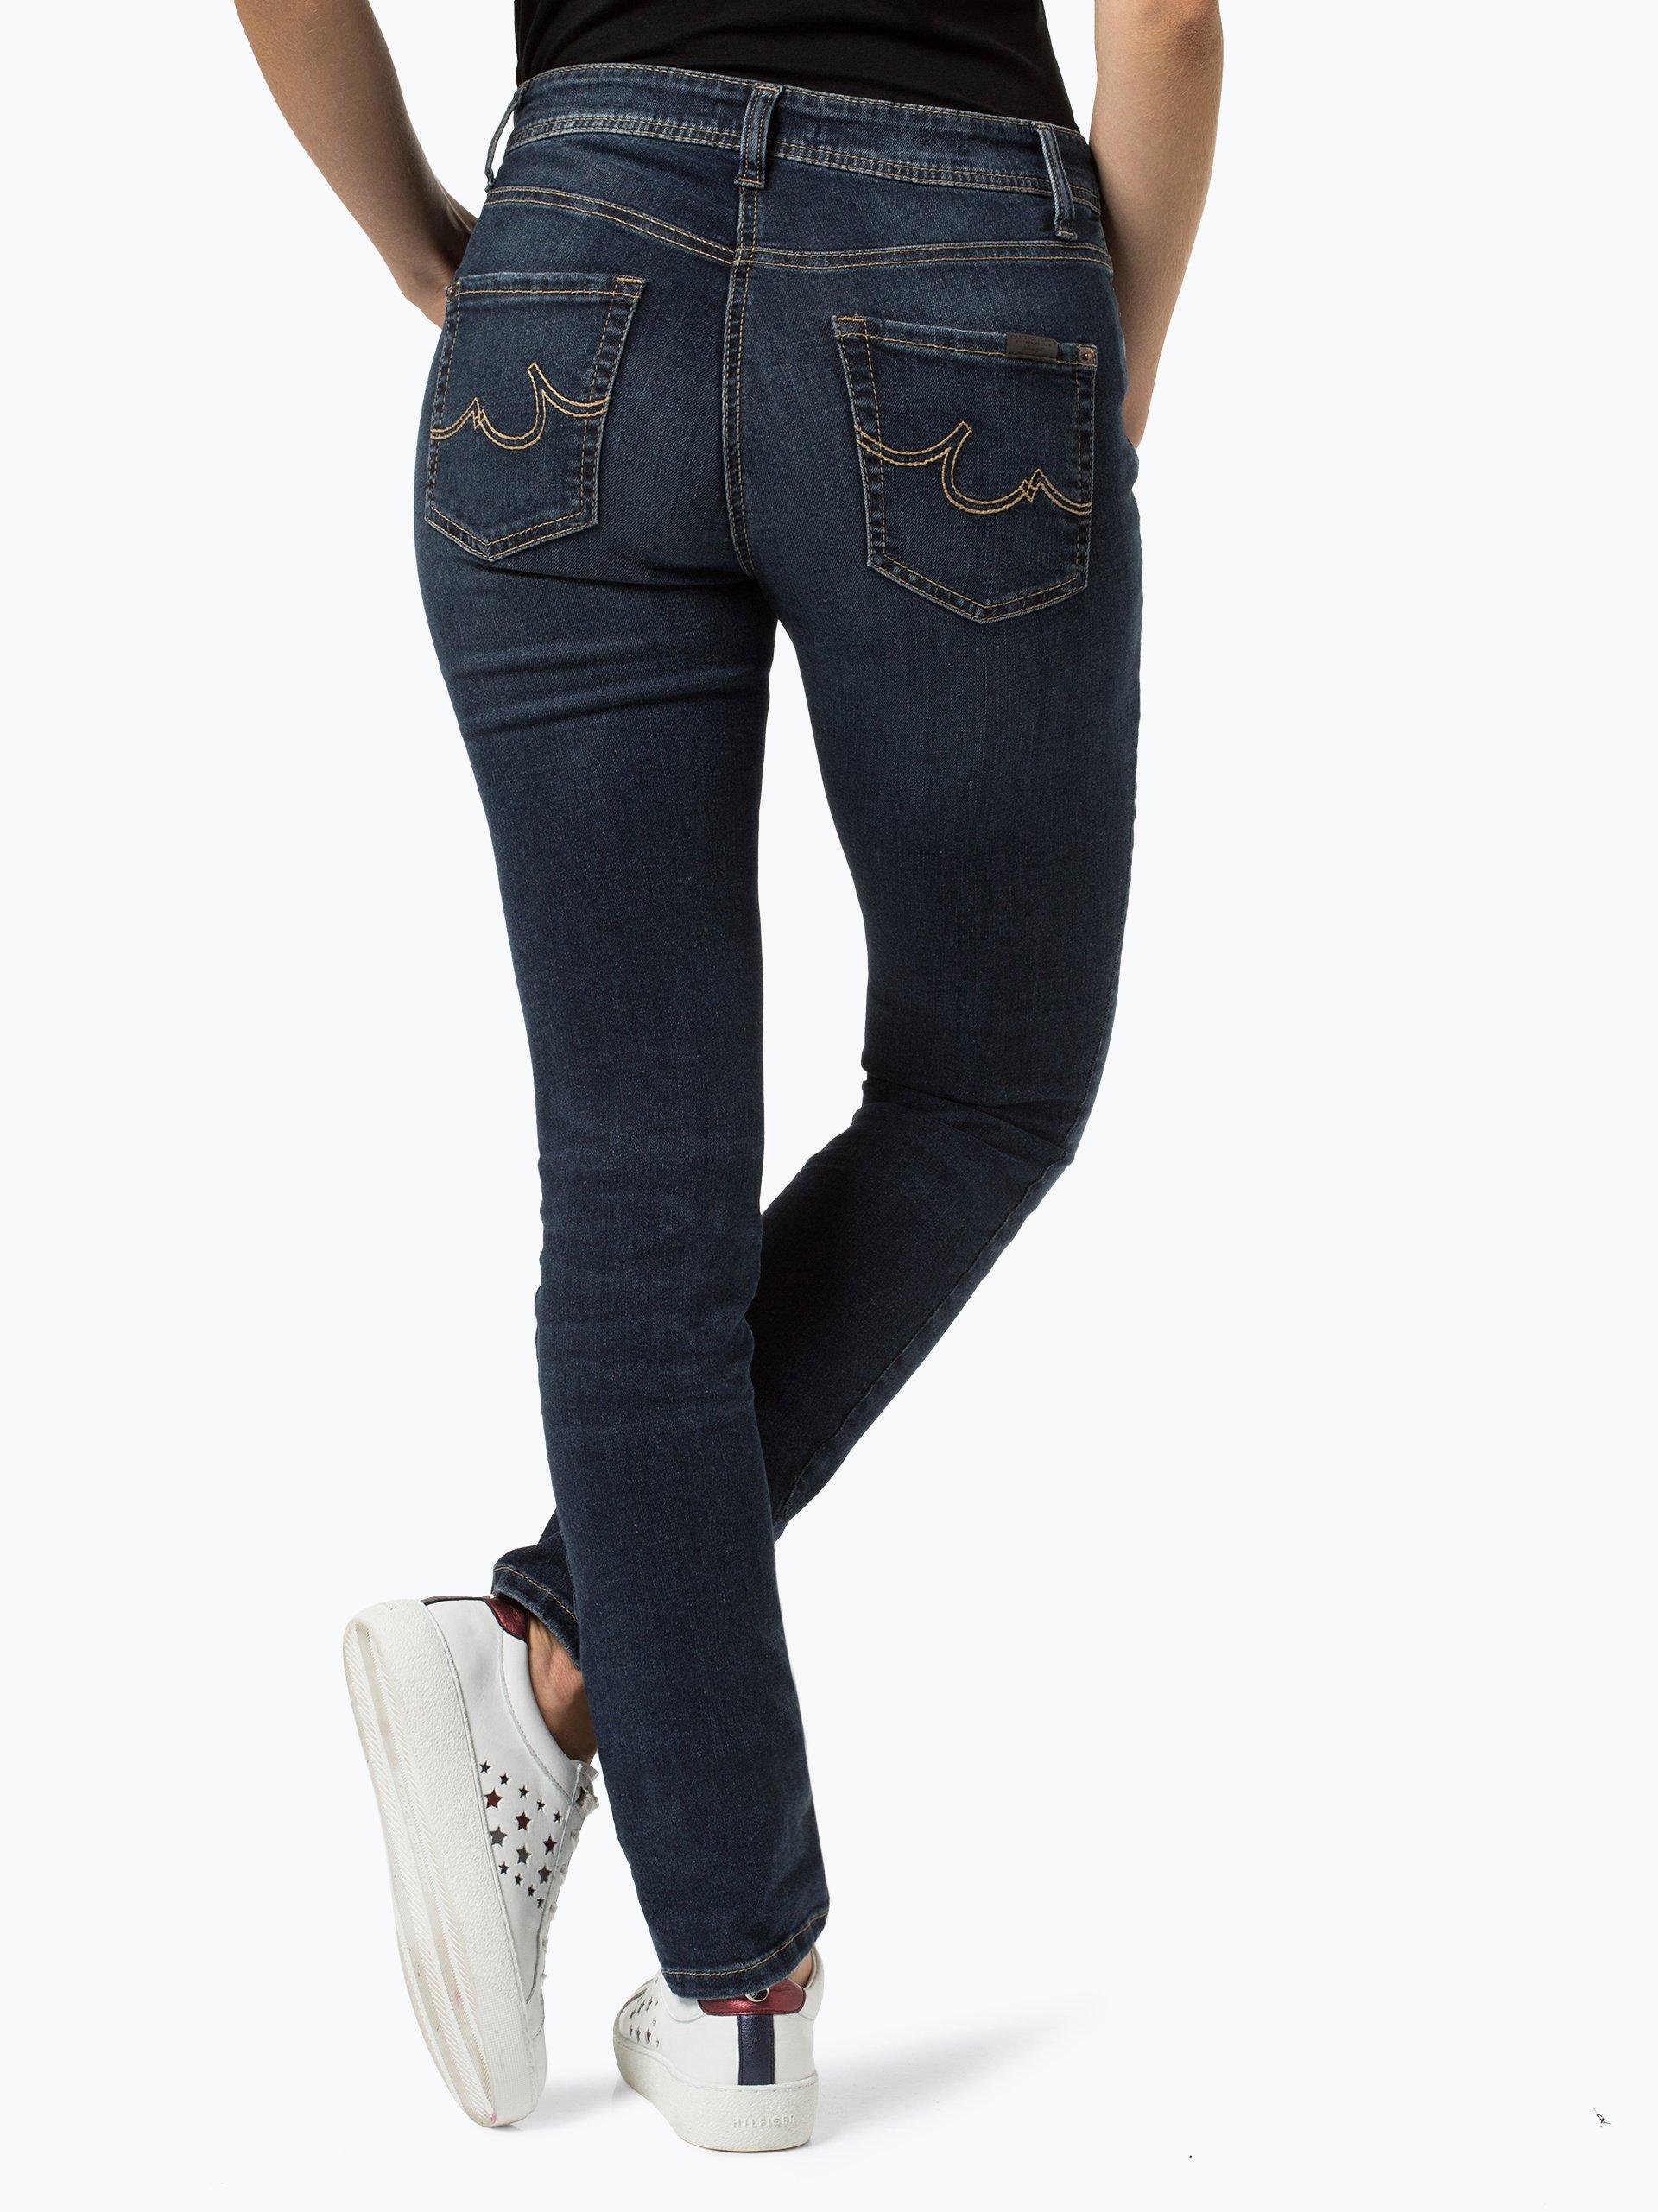 cambio damen jeans parla dark stone uni online kaufen. Black Bedroom Furniture Sets. Home Design Ideas